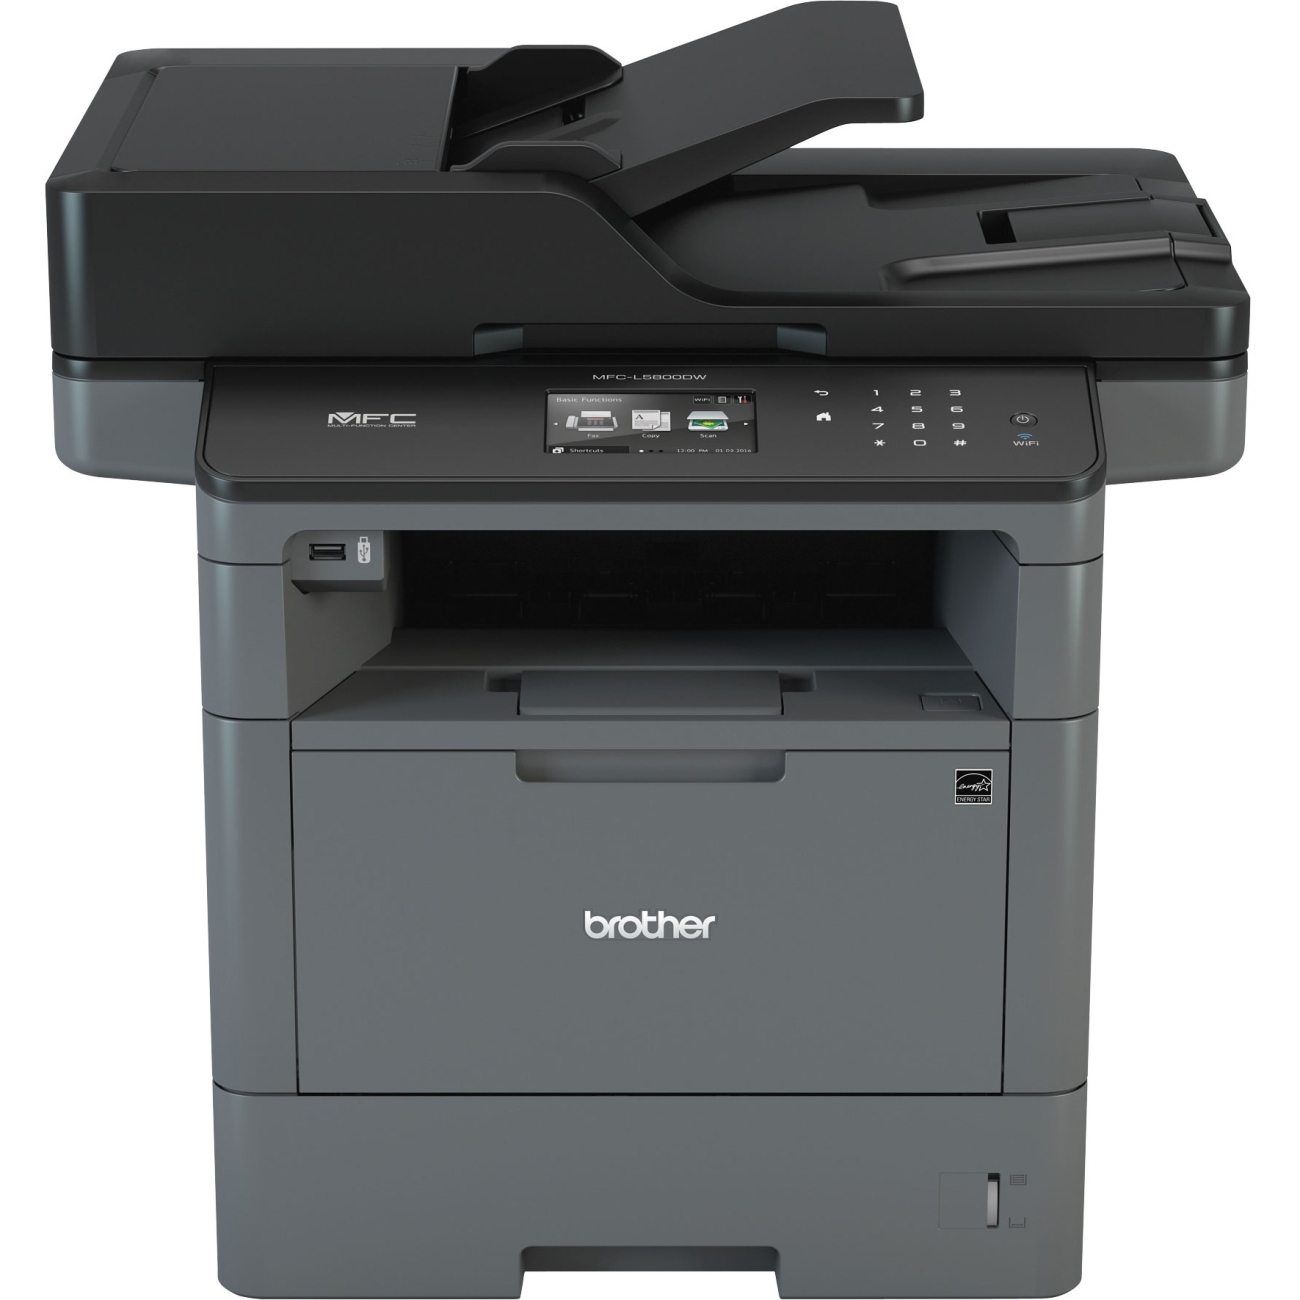 Brother Mfc-l5800dw Laser Multifunction Printer - Monochr...